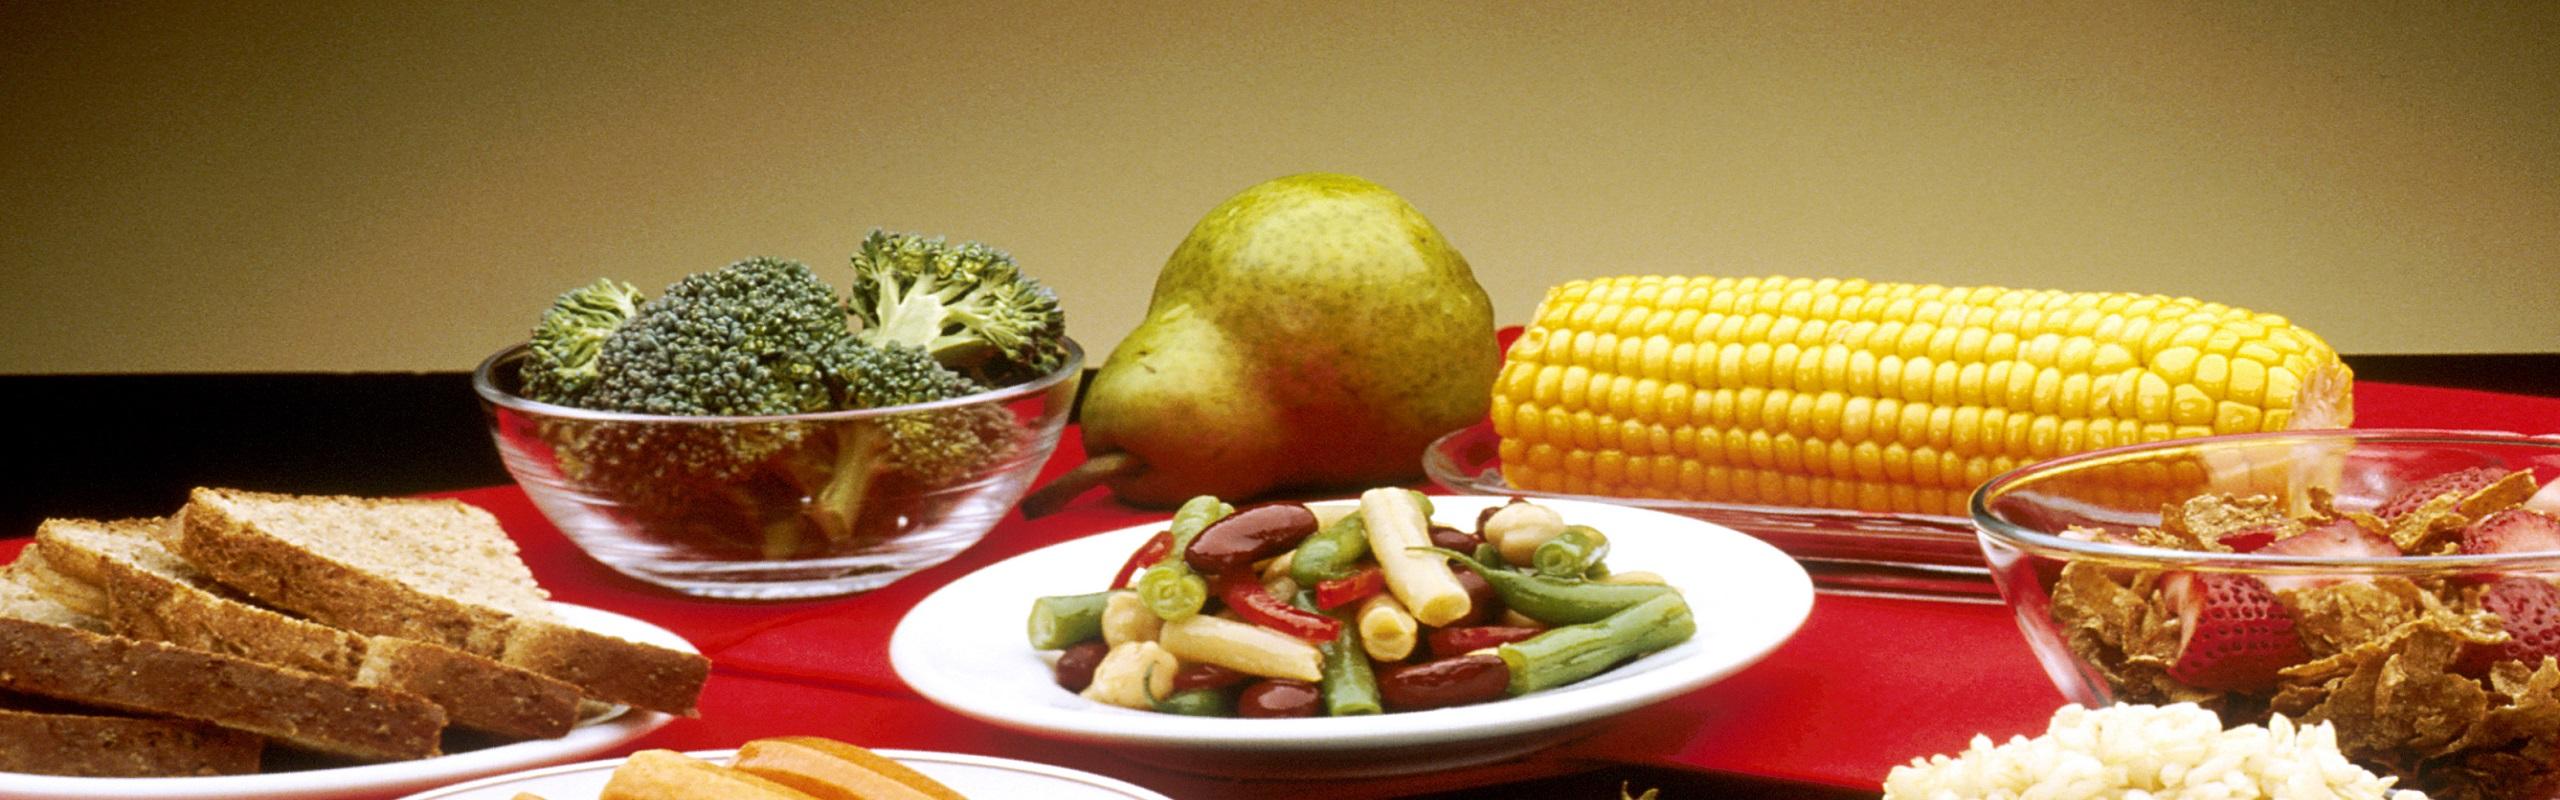 Food Banjaluka